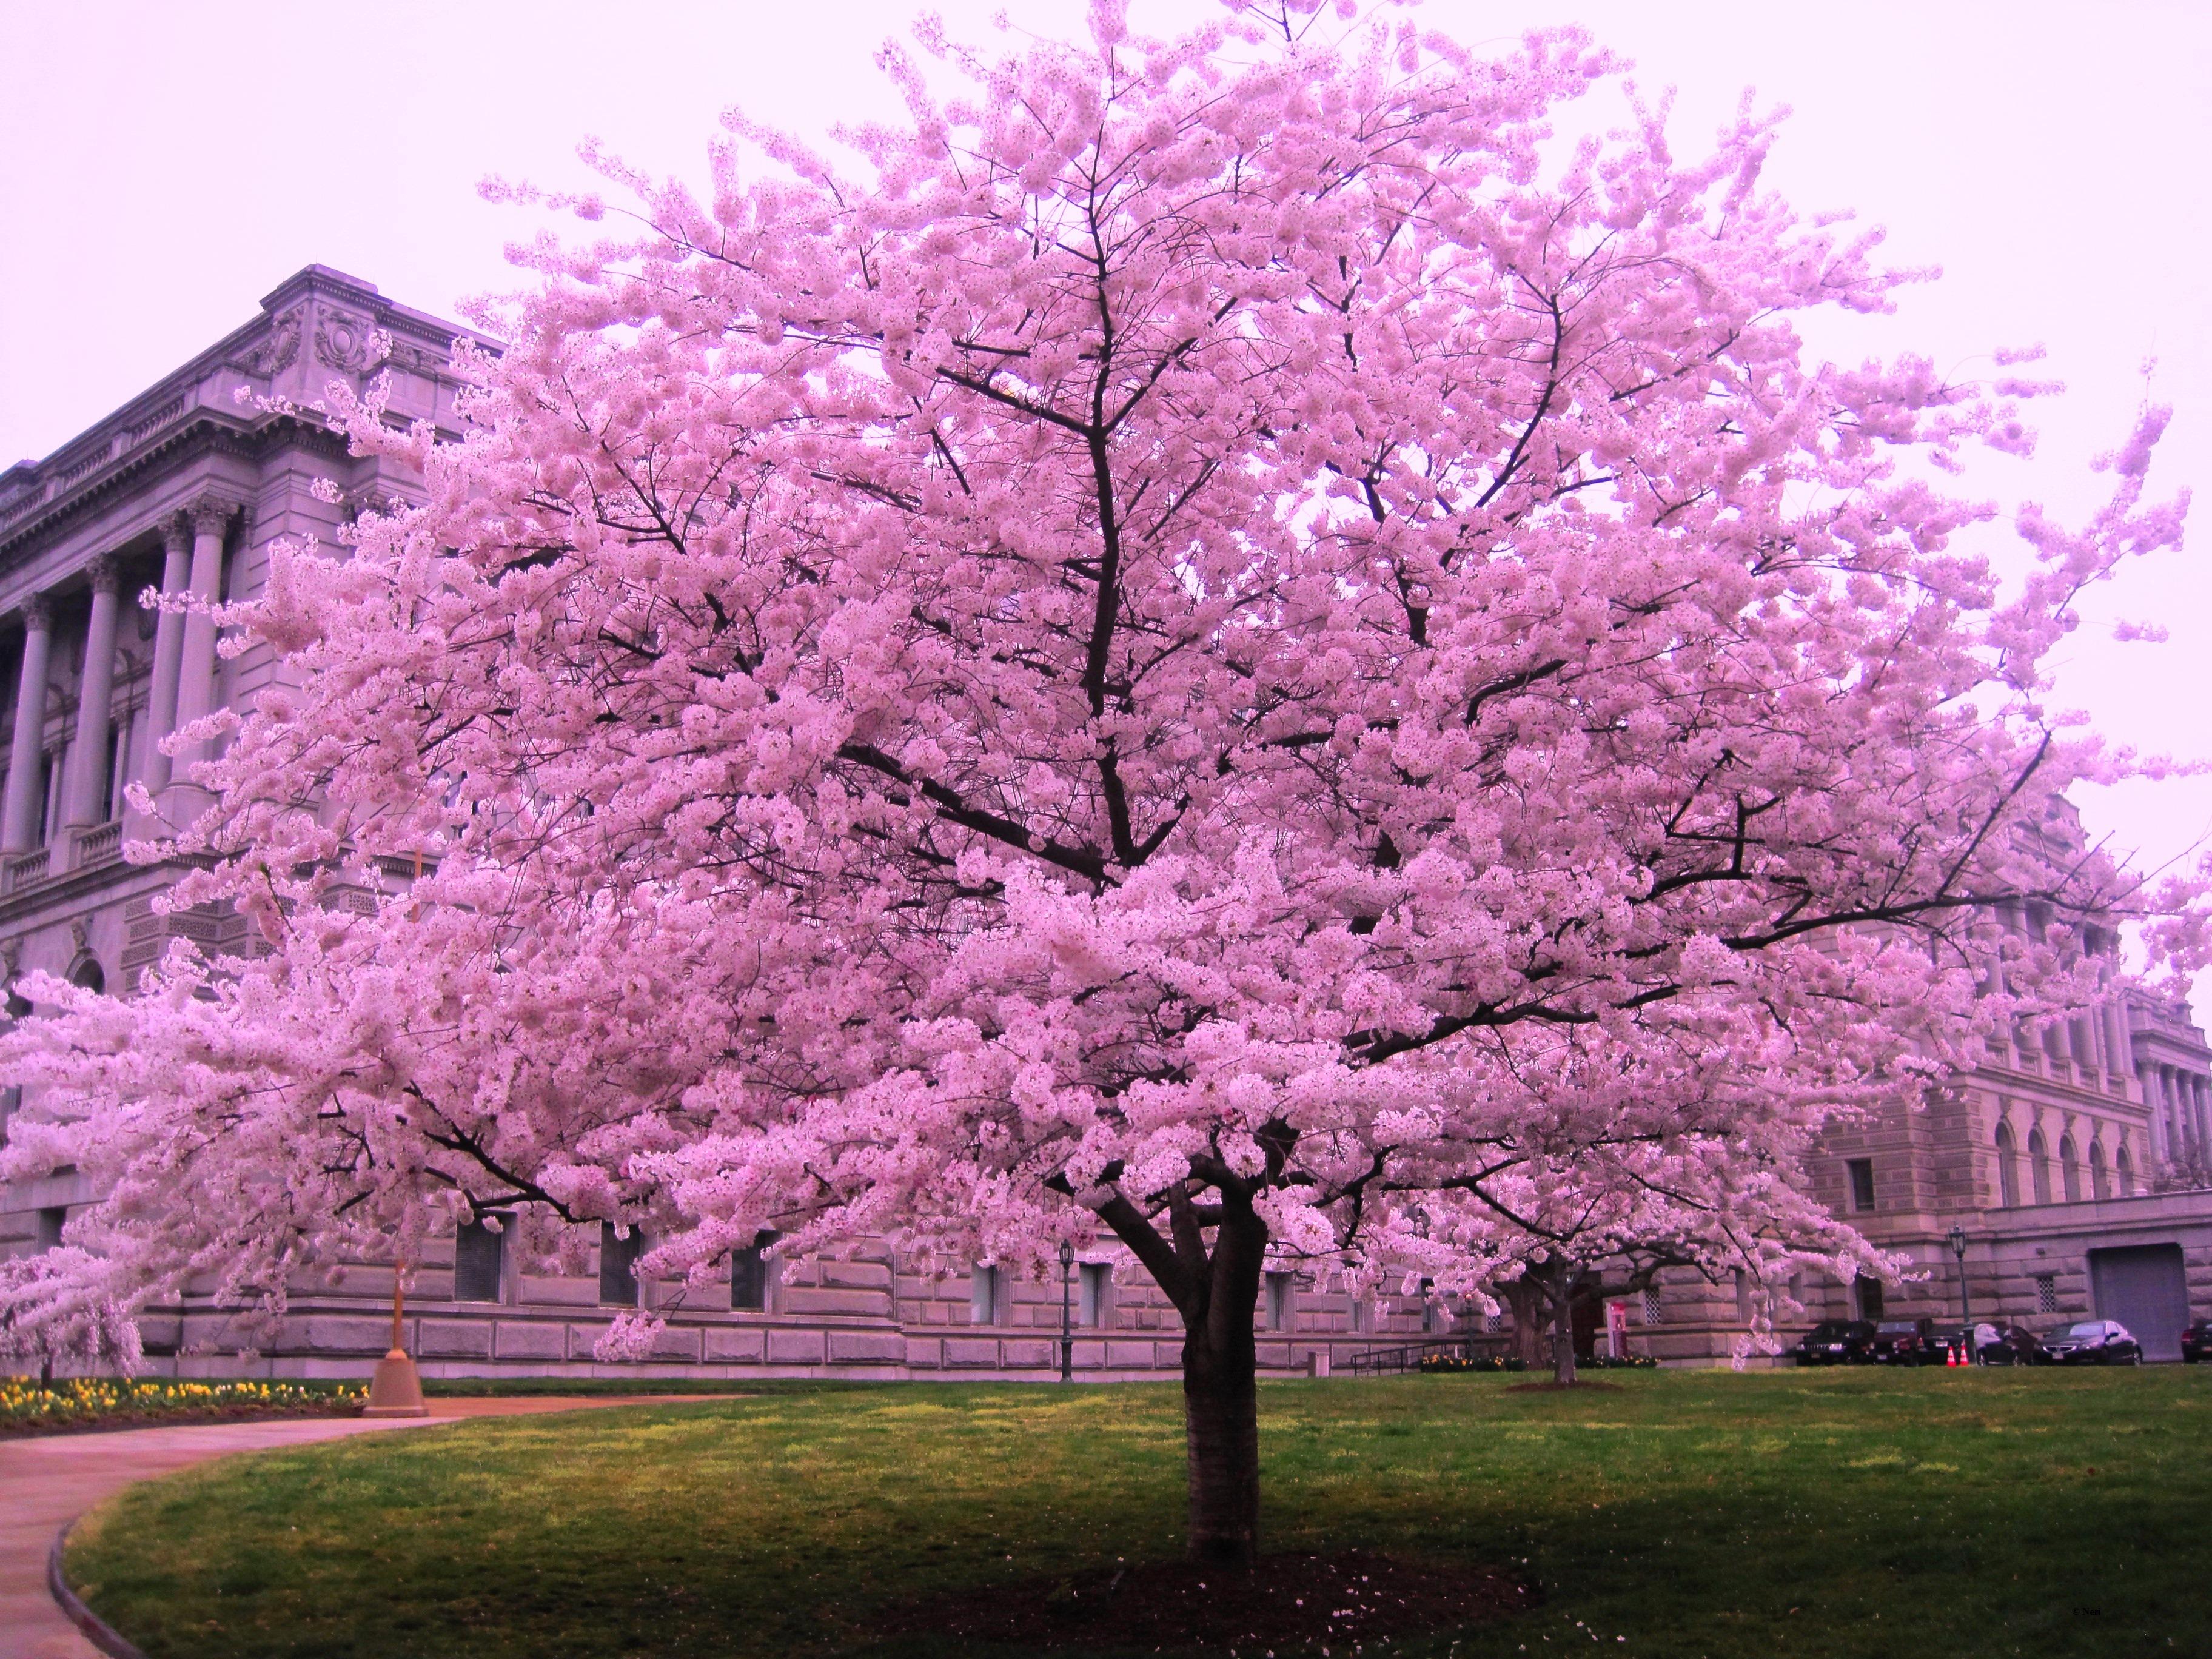 cherry blossom wallpaper erry Blossom Computer Wallpapers rh